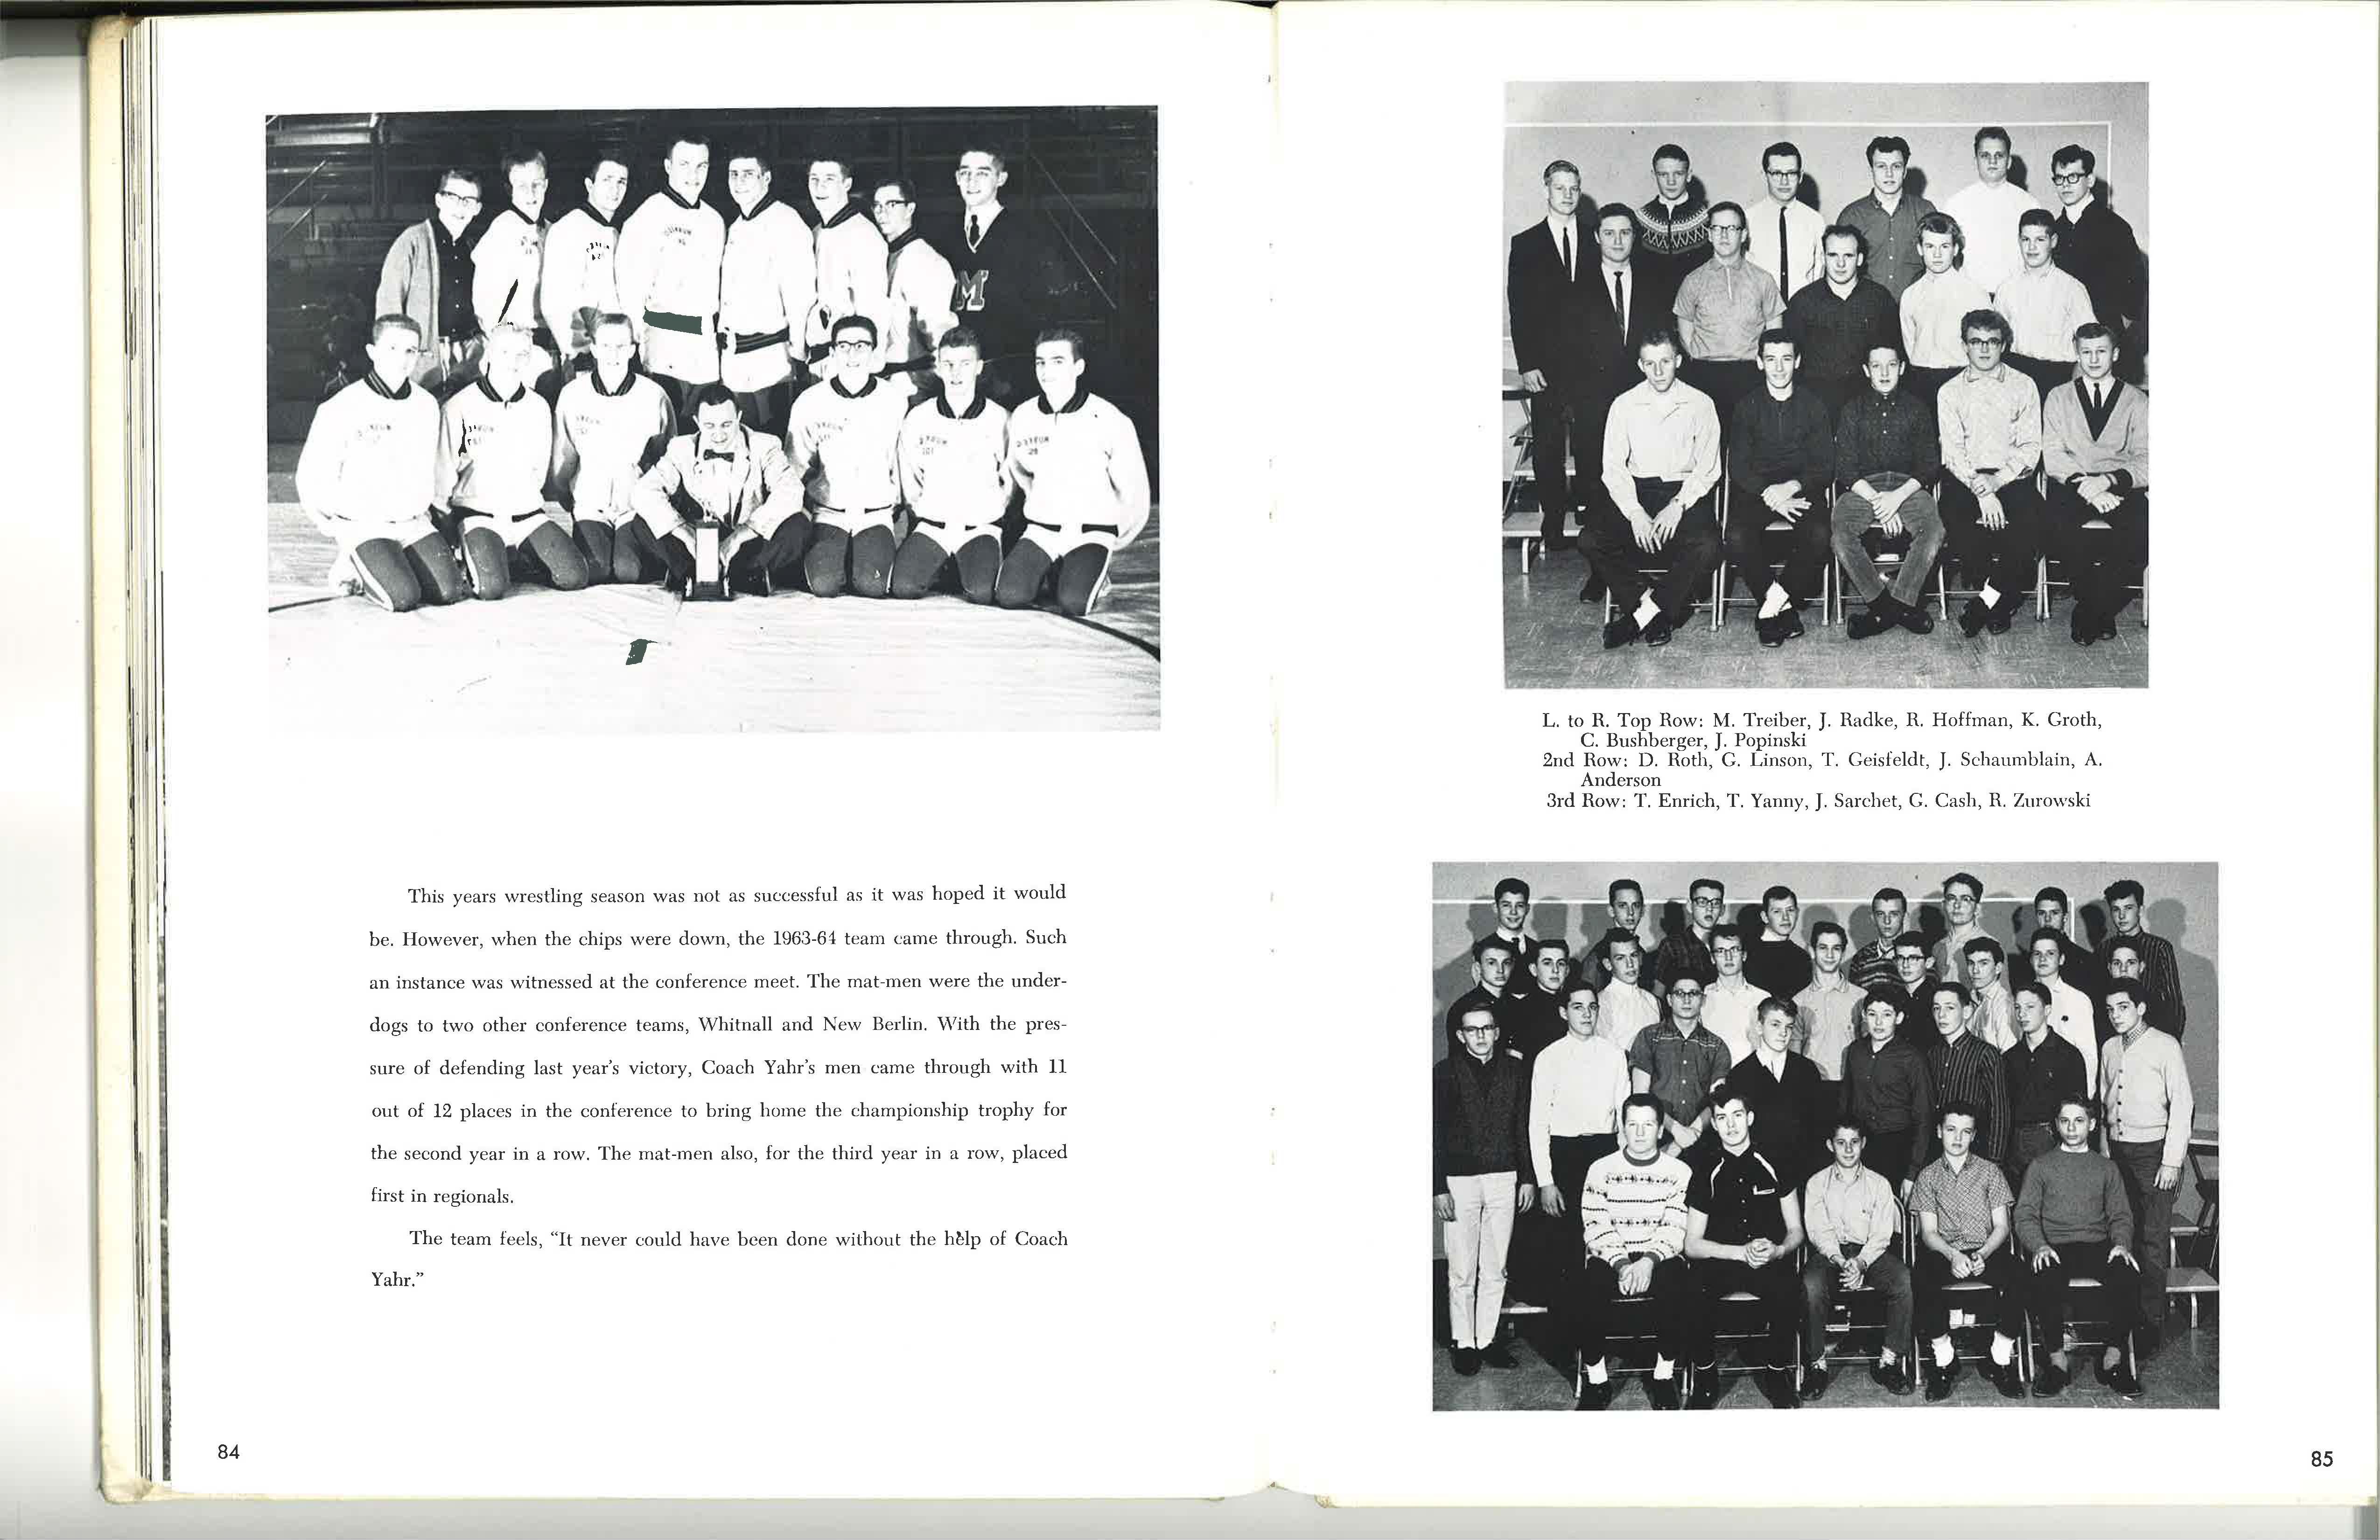 1964_Yearbook_Athletics_84-85.jpg